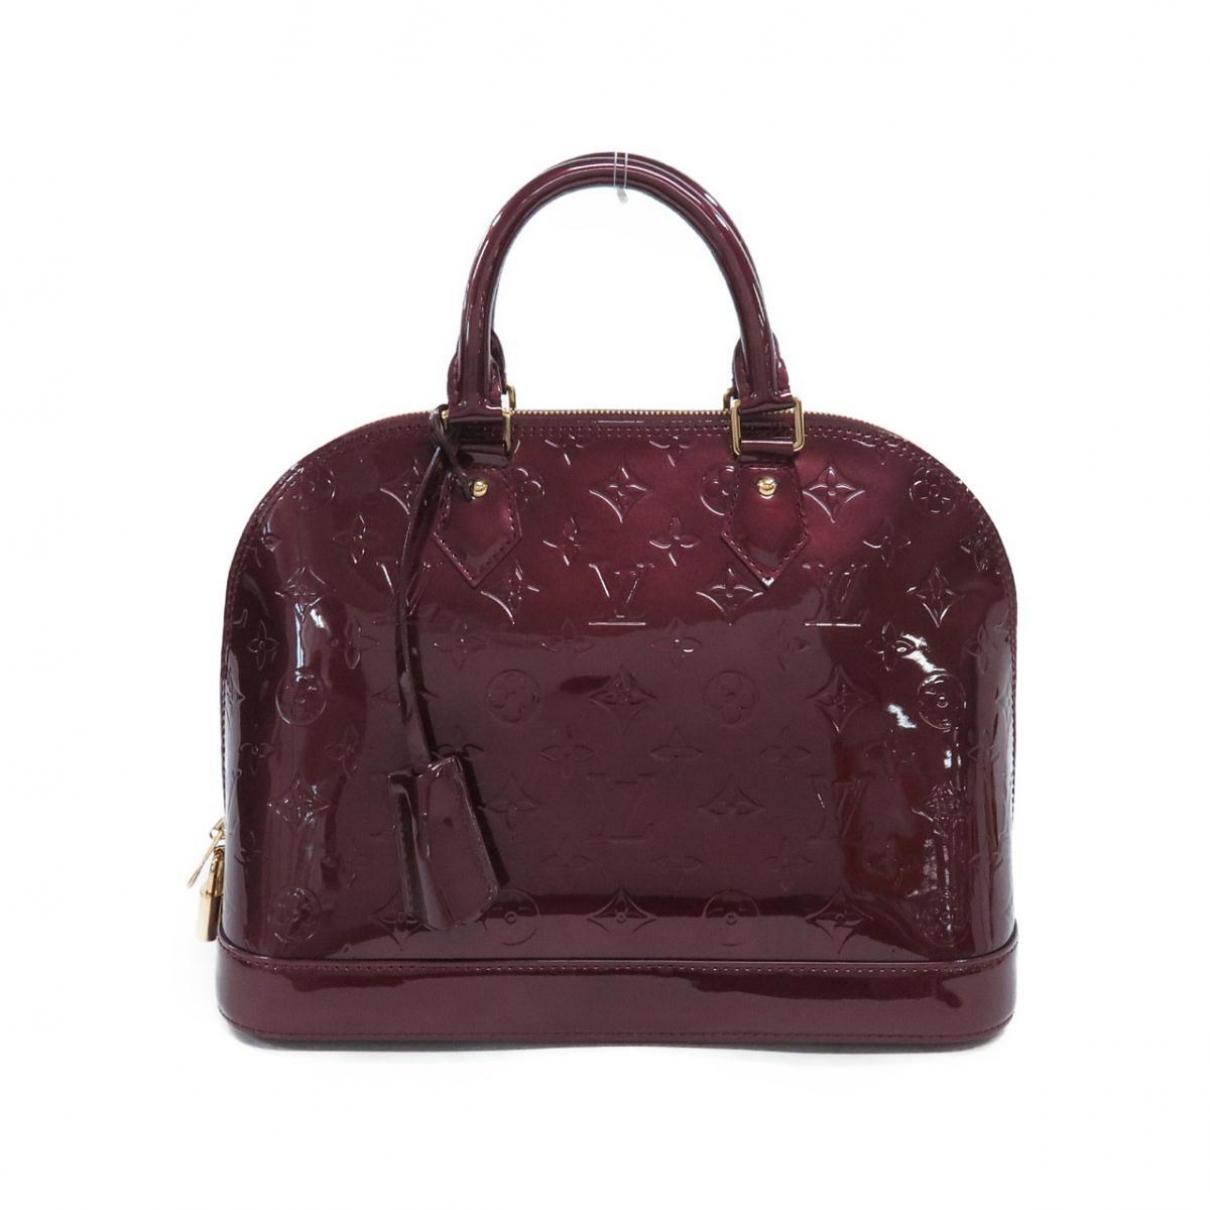 Louis Vuitton Alma Burgundy Patent leather handbag for Women \N